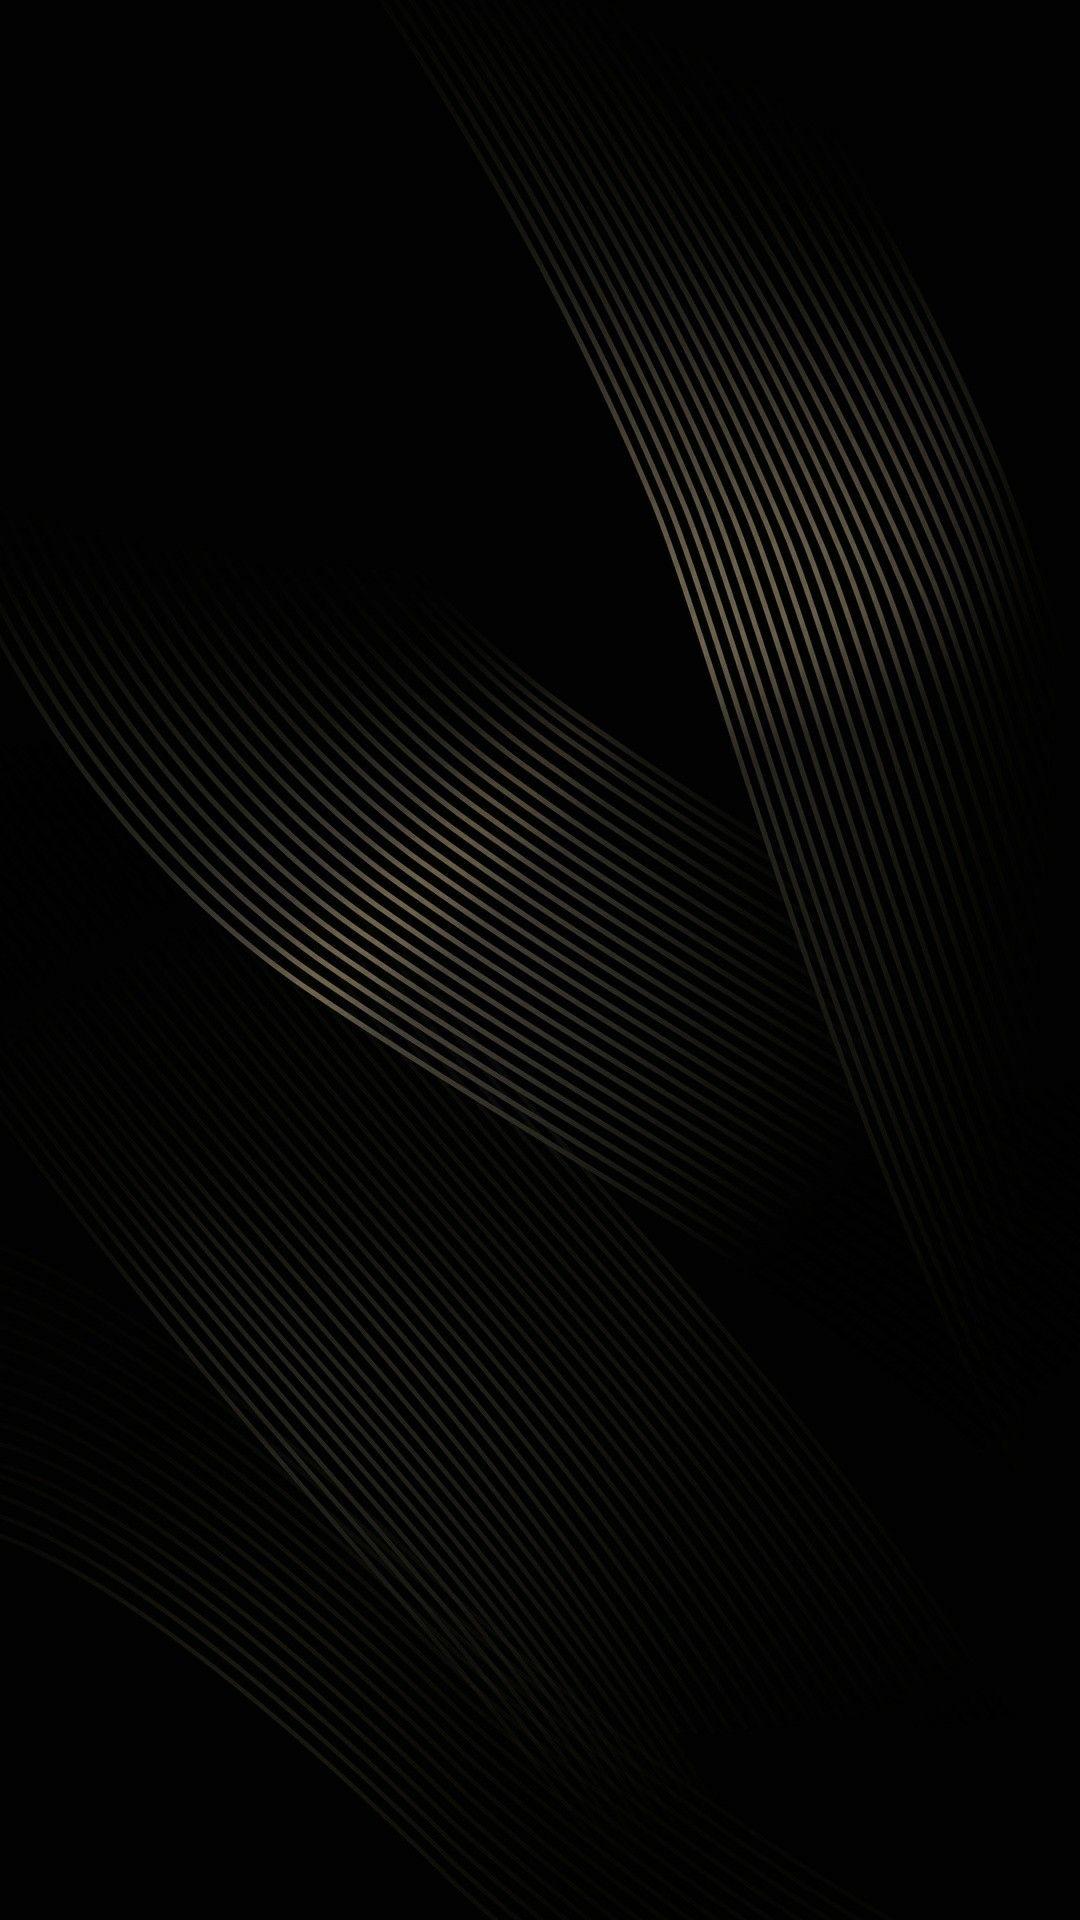 Black Ribbed Ribbon Wallpaper Black Wallpaper Black Phone Wallpaper Backgrounds Phone Wallpapers